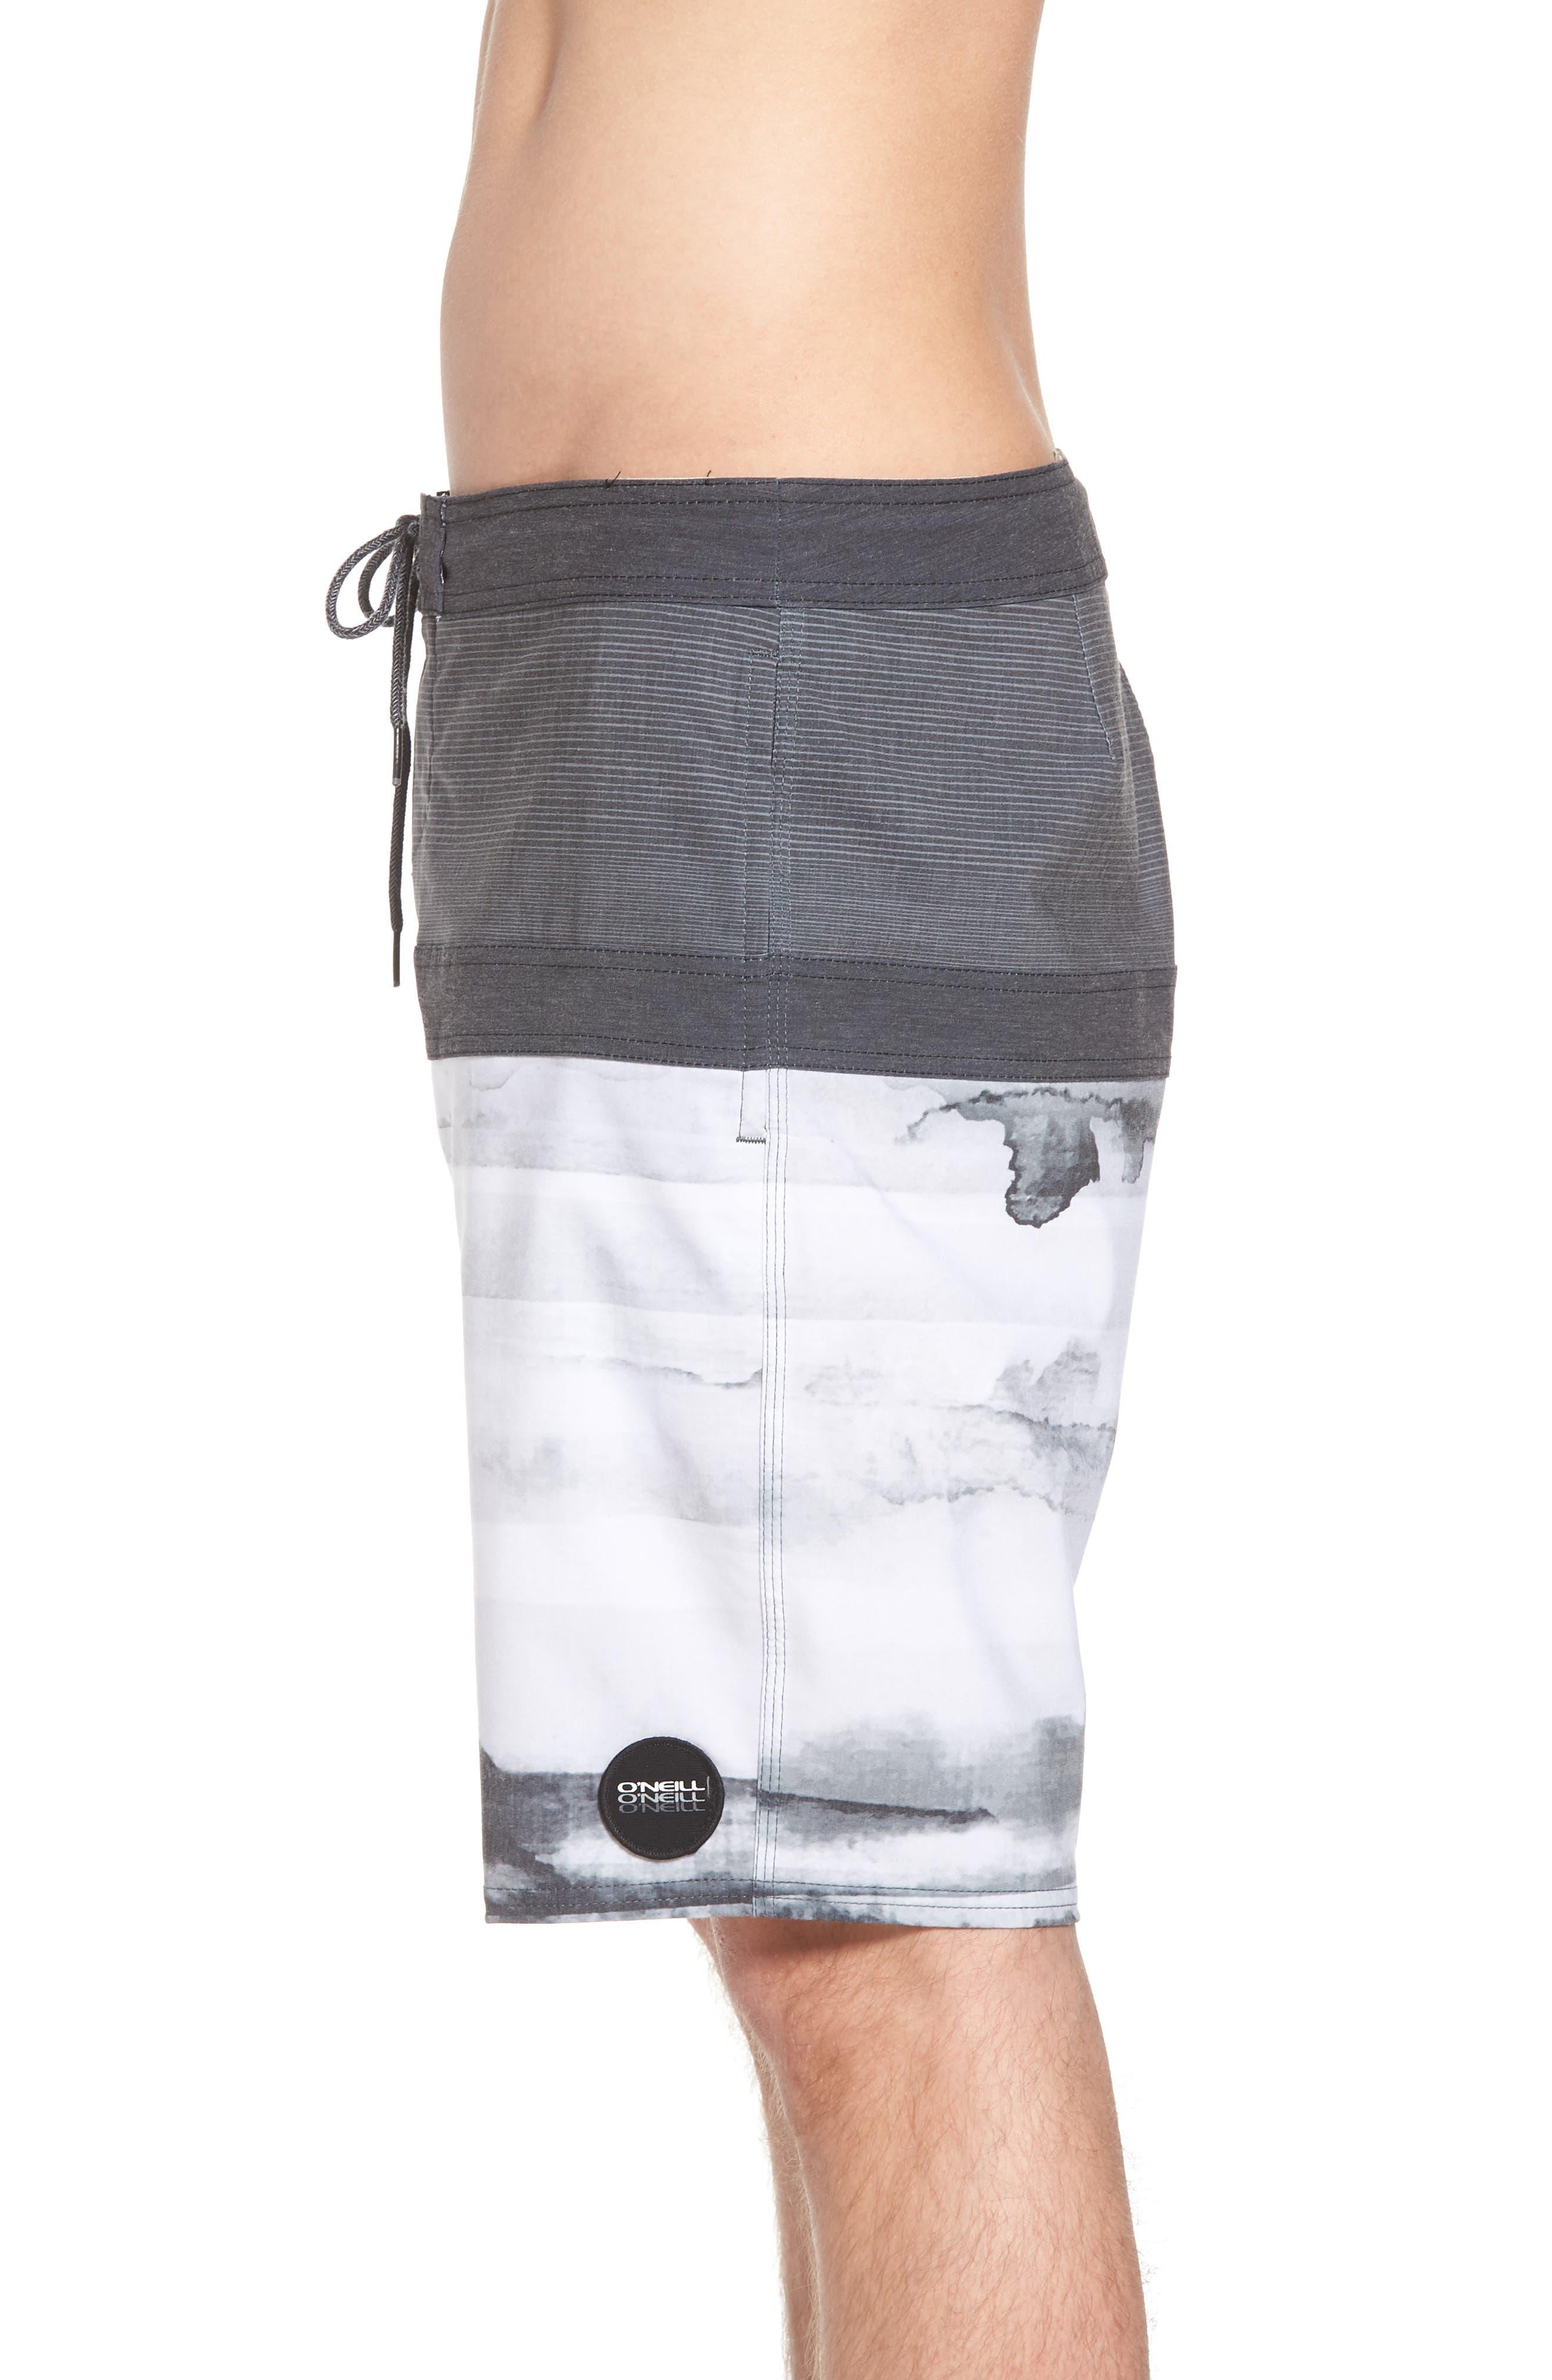 Breaker Cruzer Board Shorts,                             Alternate thumbnail 3, color,                             Black